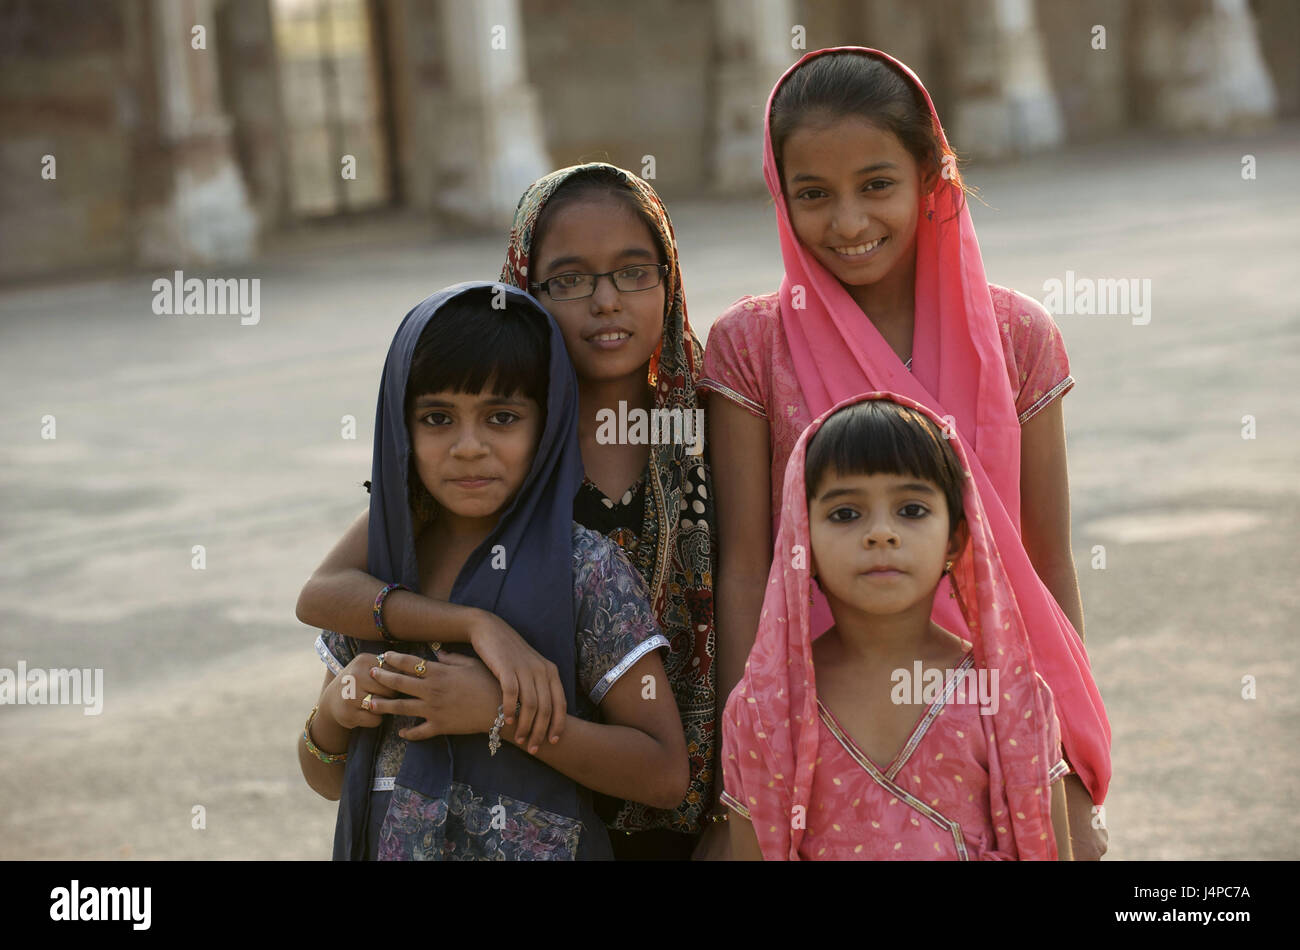 India, Gujarat, Ahmedabad, Sarkhej, young persons, - Stock Image